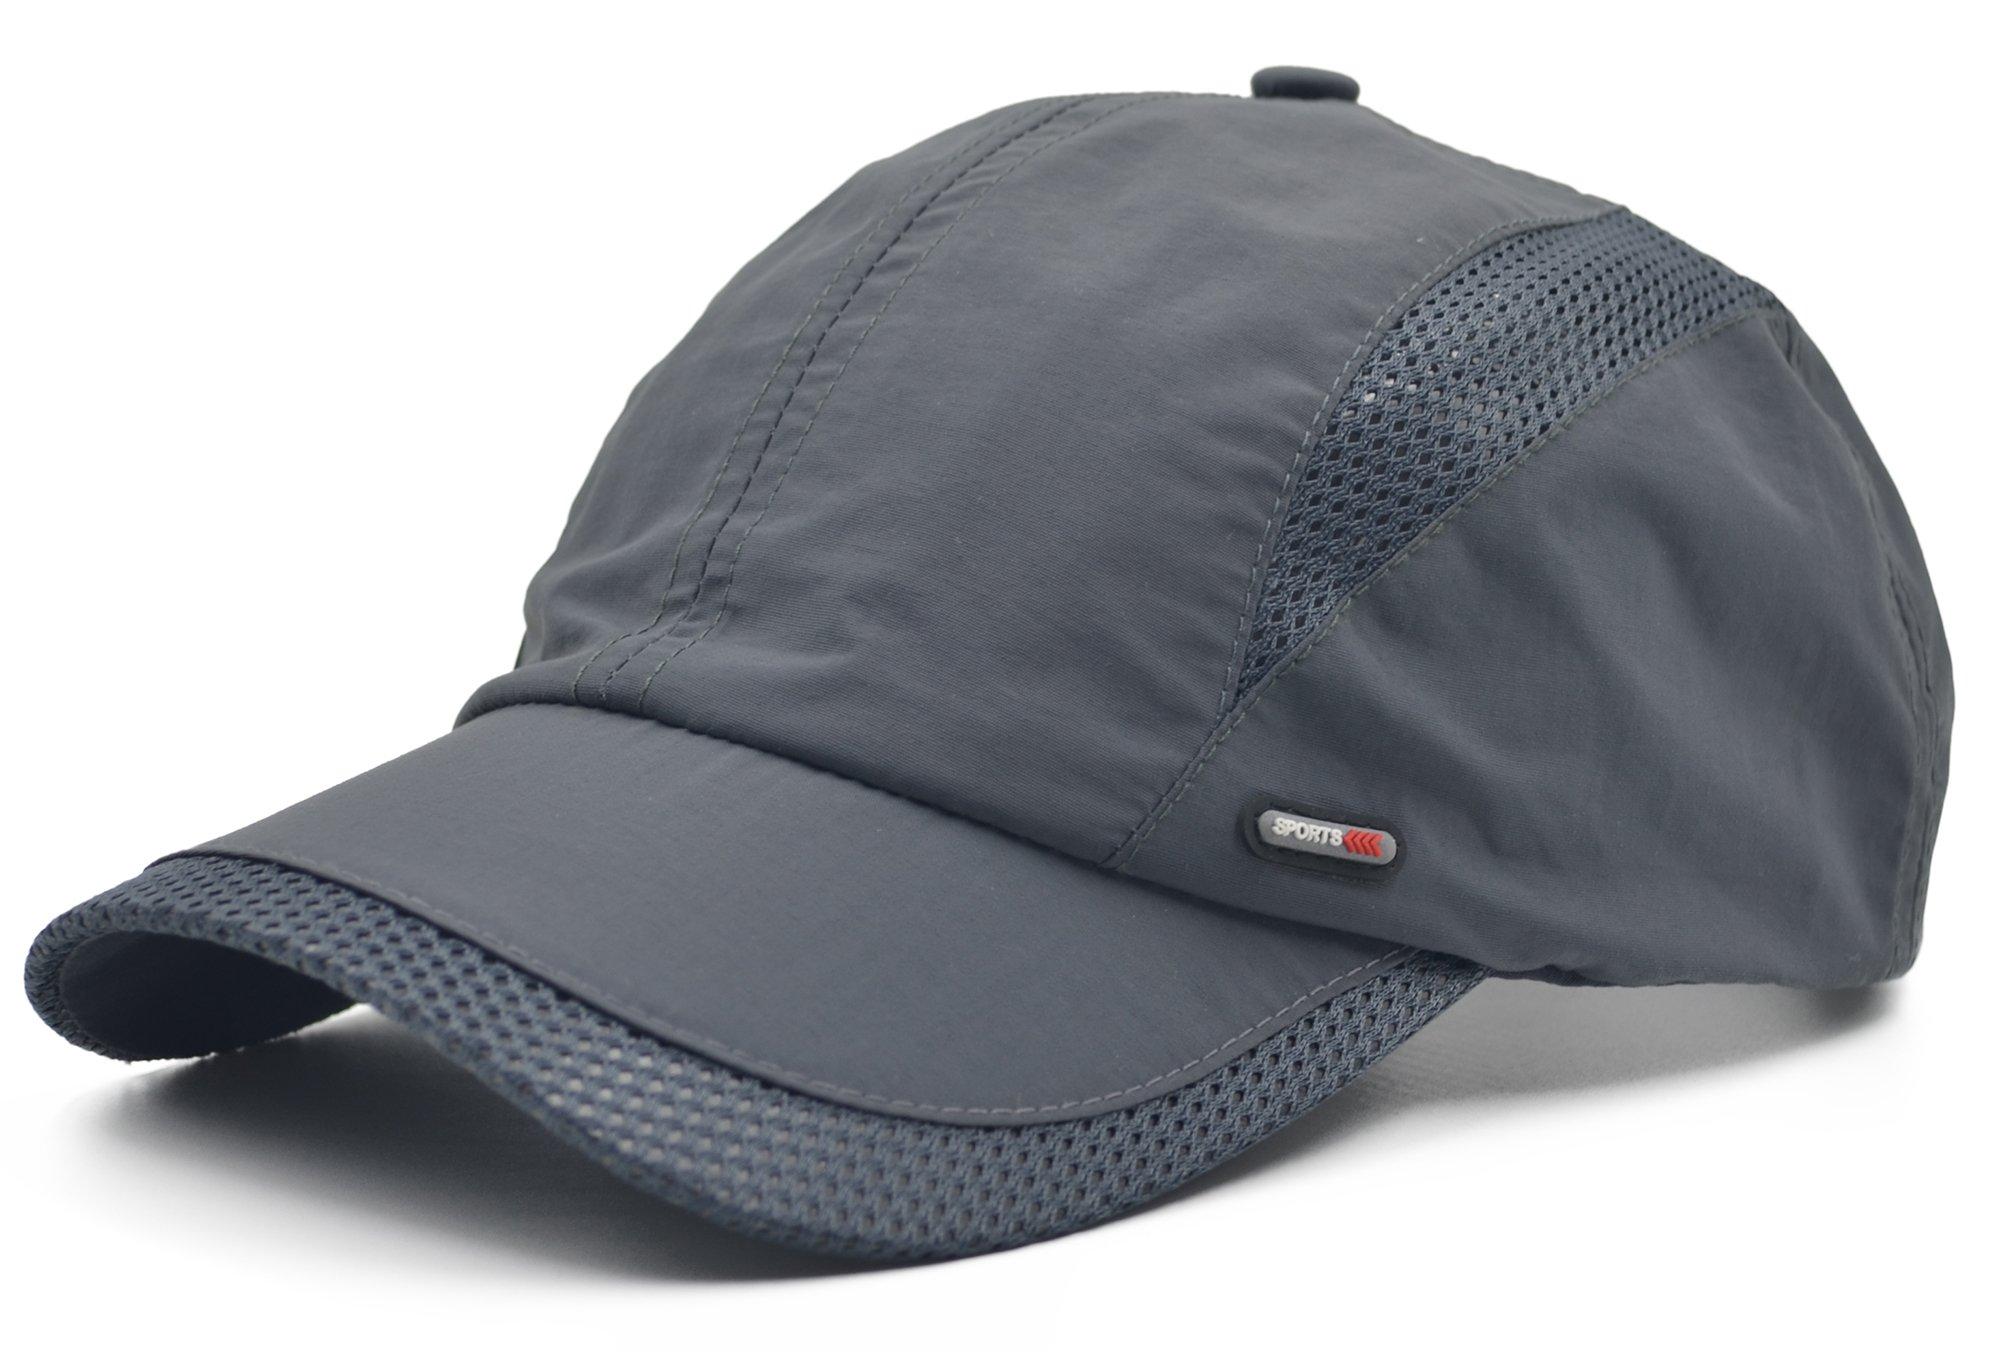 Melesh Adjustable Summer Mesh Golf Outdoor Sport Visor Fishing Baseball Hat Cap (Gray)